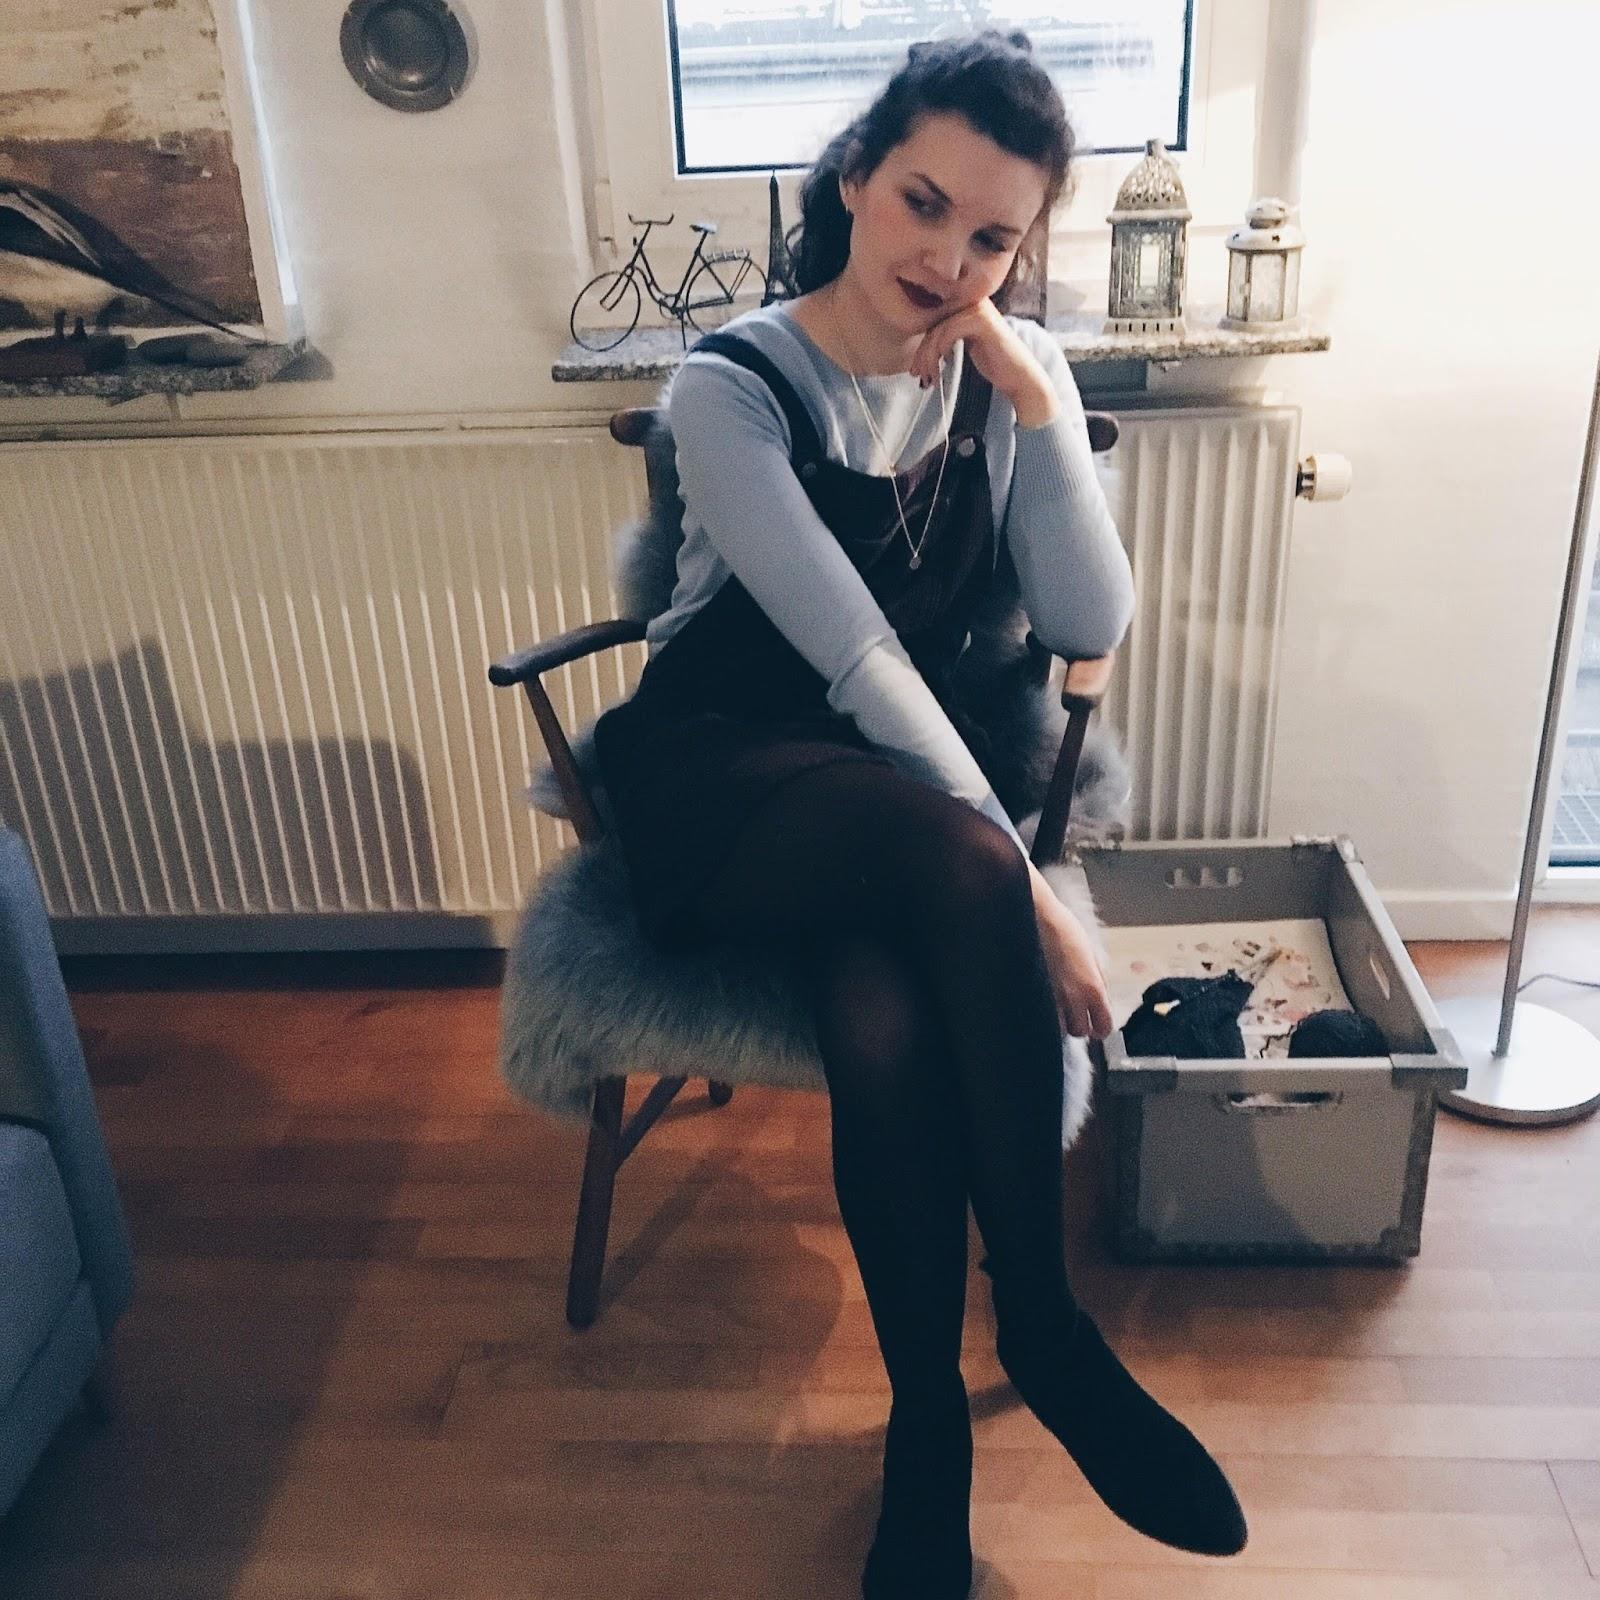 brooklyn is burning, blue jumper, pinafore dress, topshop dress, pinafore topshop, fashion blogger, personal style blogger